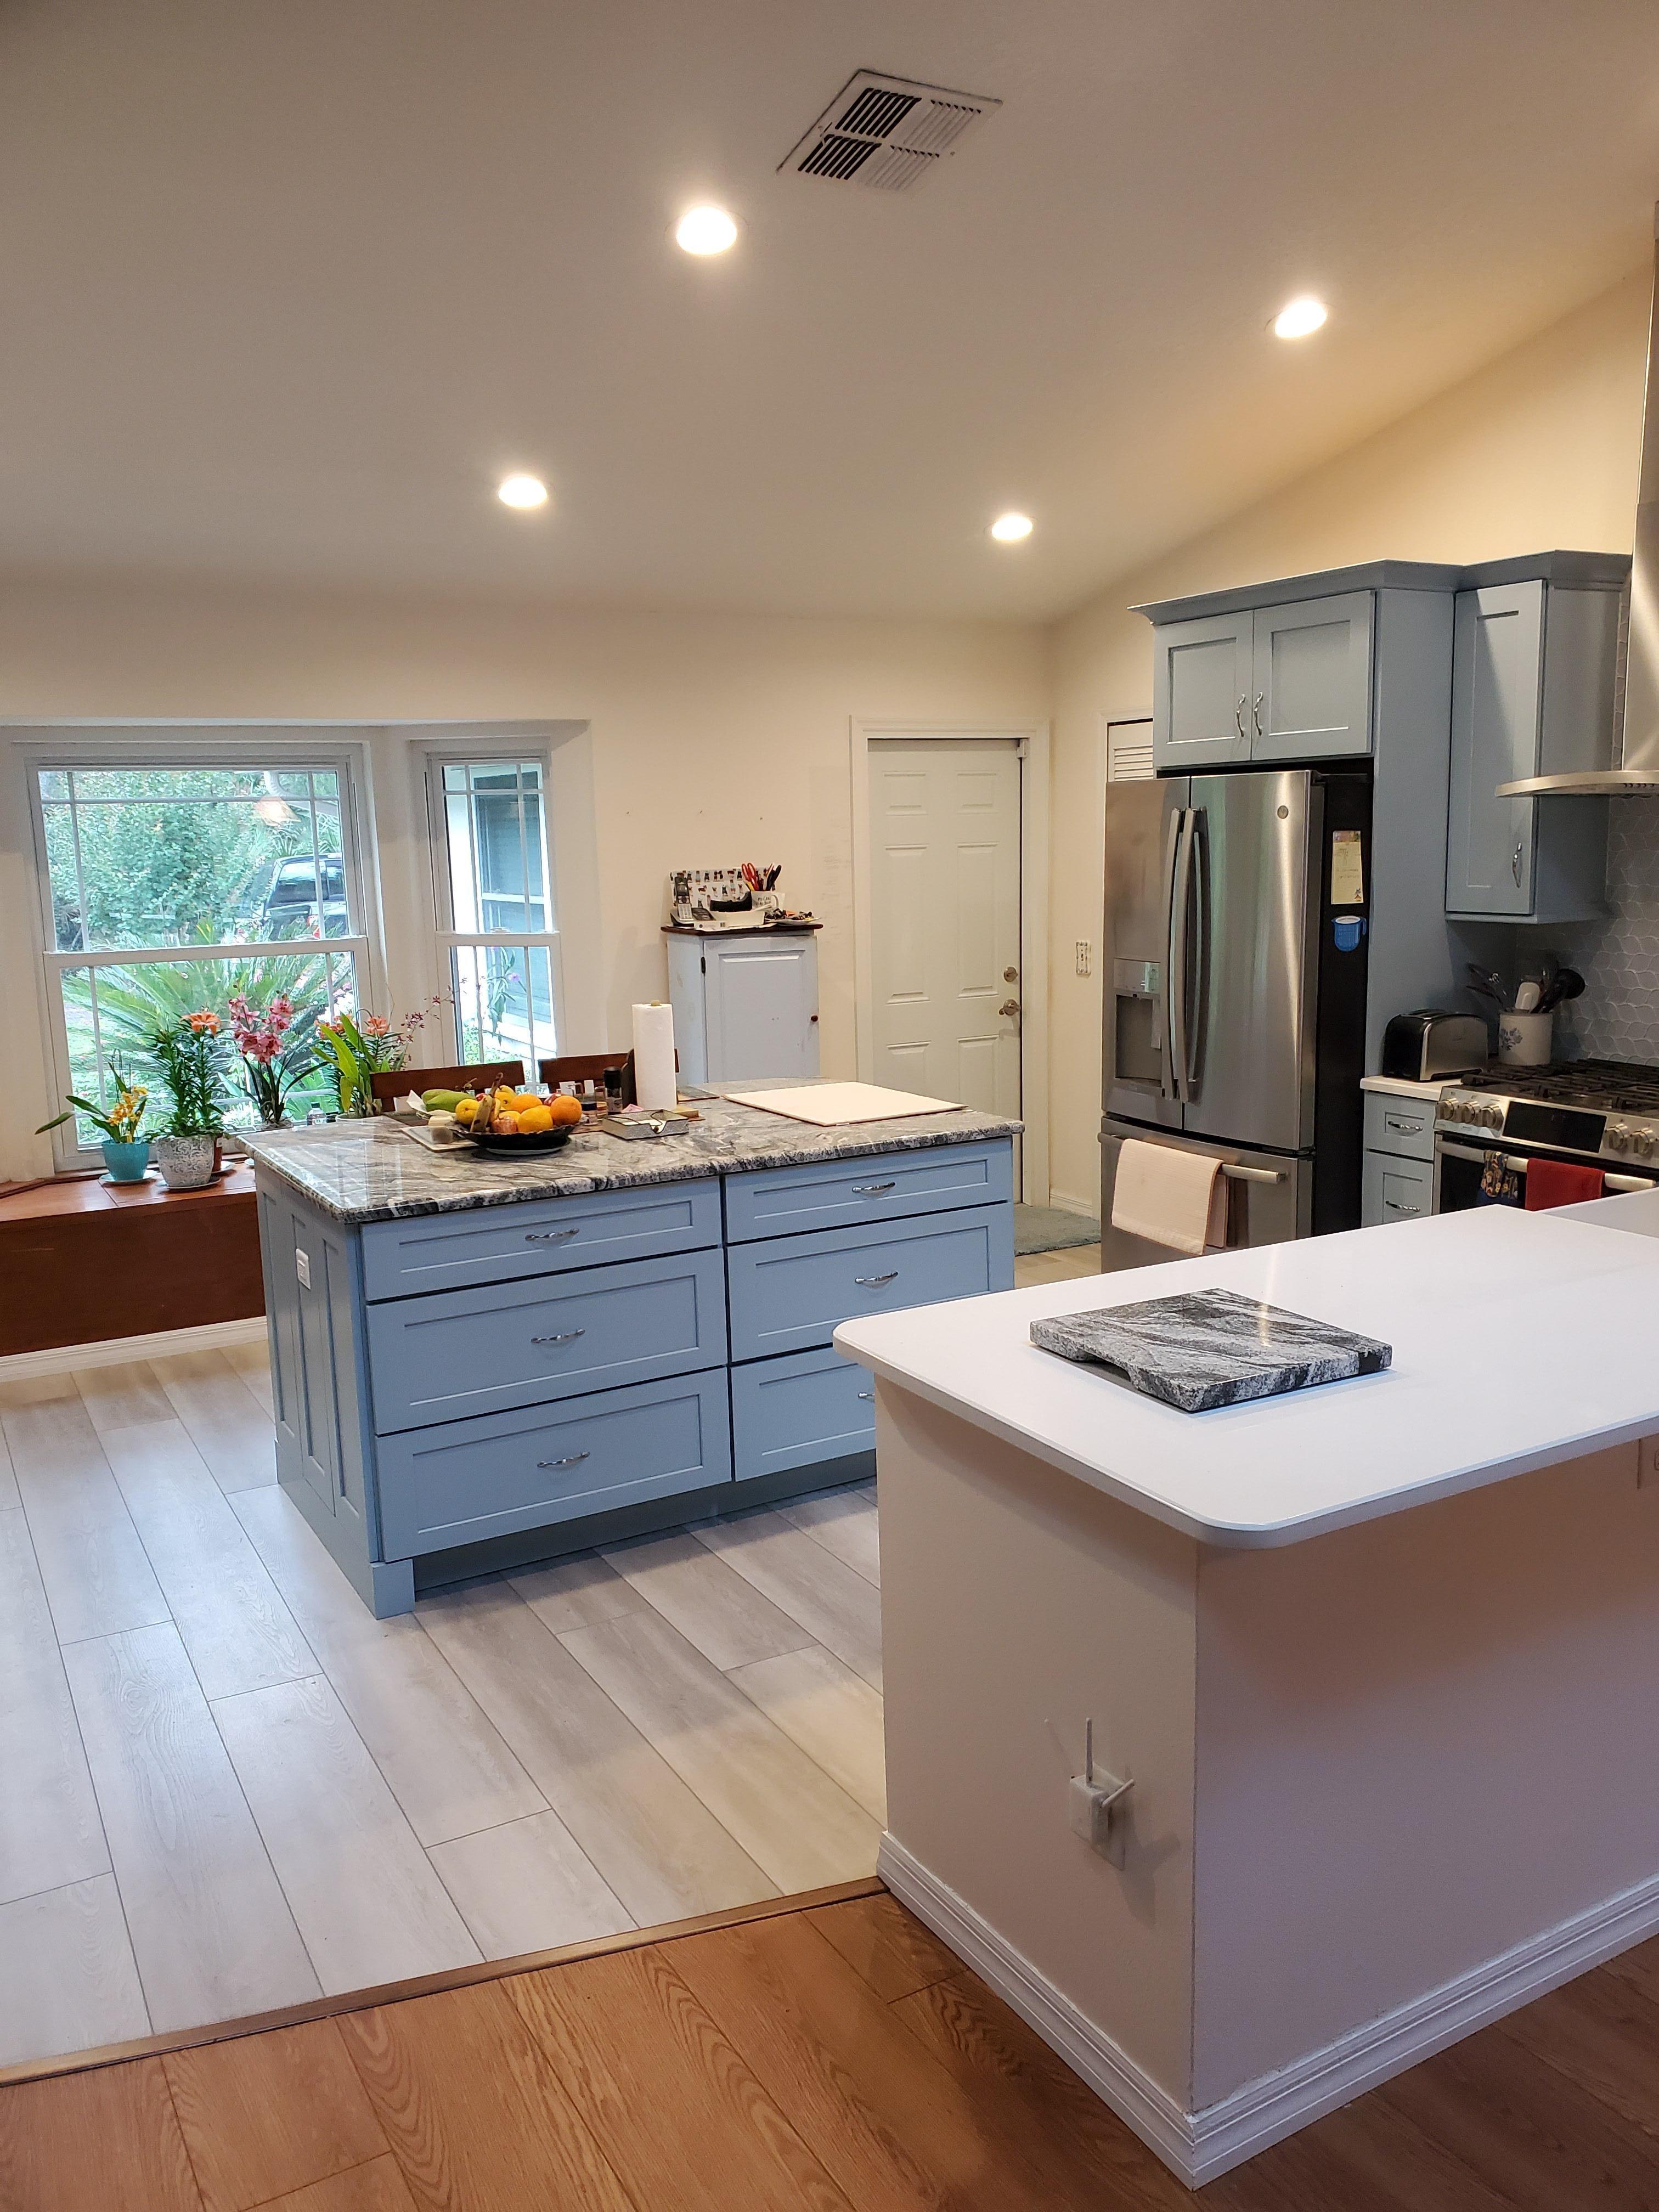 Powder Blue Kitchen In 2020 Blue Kitchens Blue Cabinets Glass Backsplash